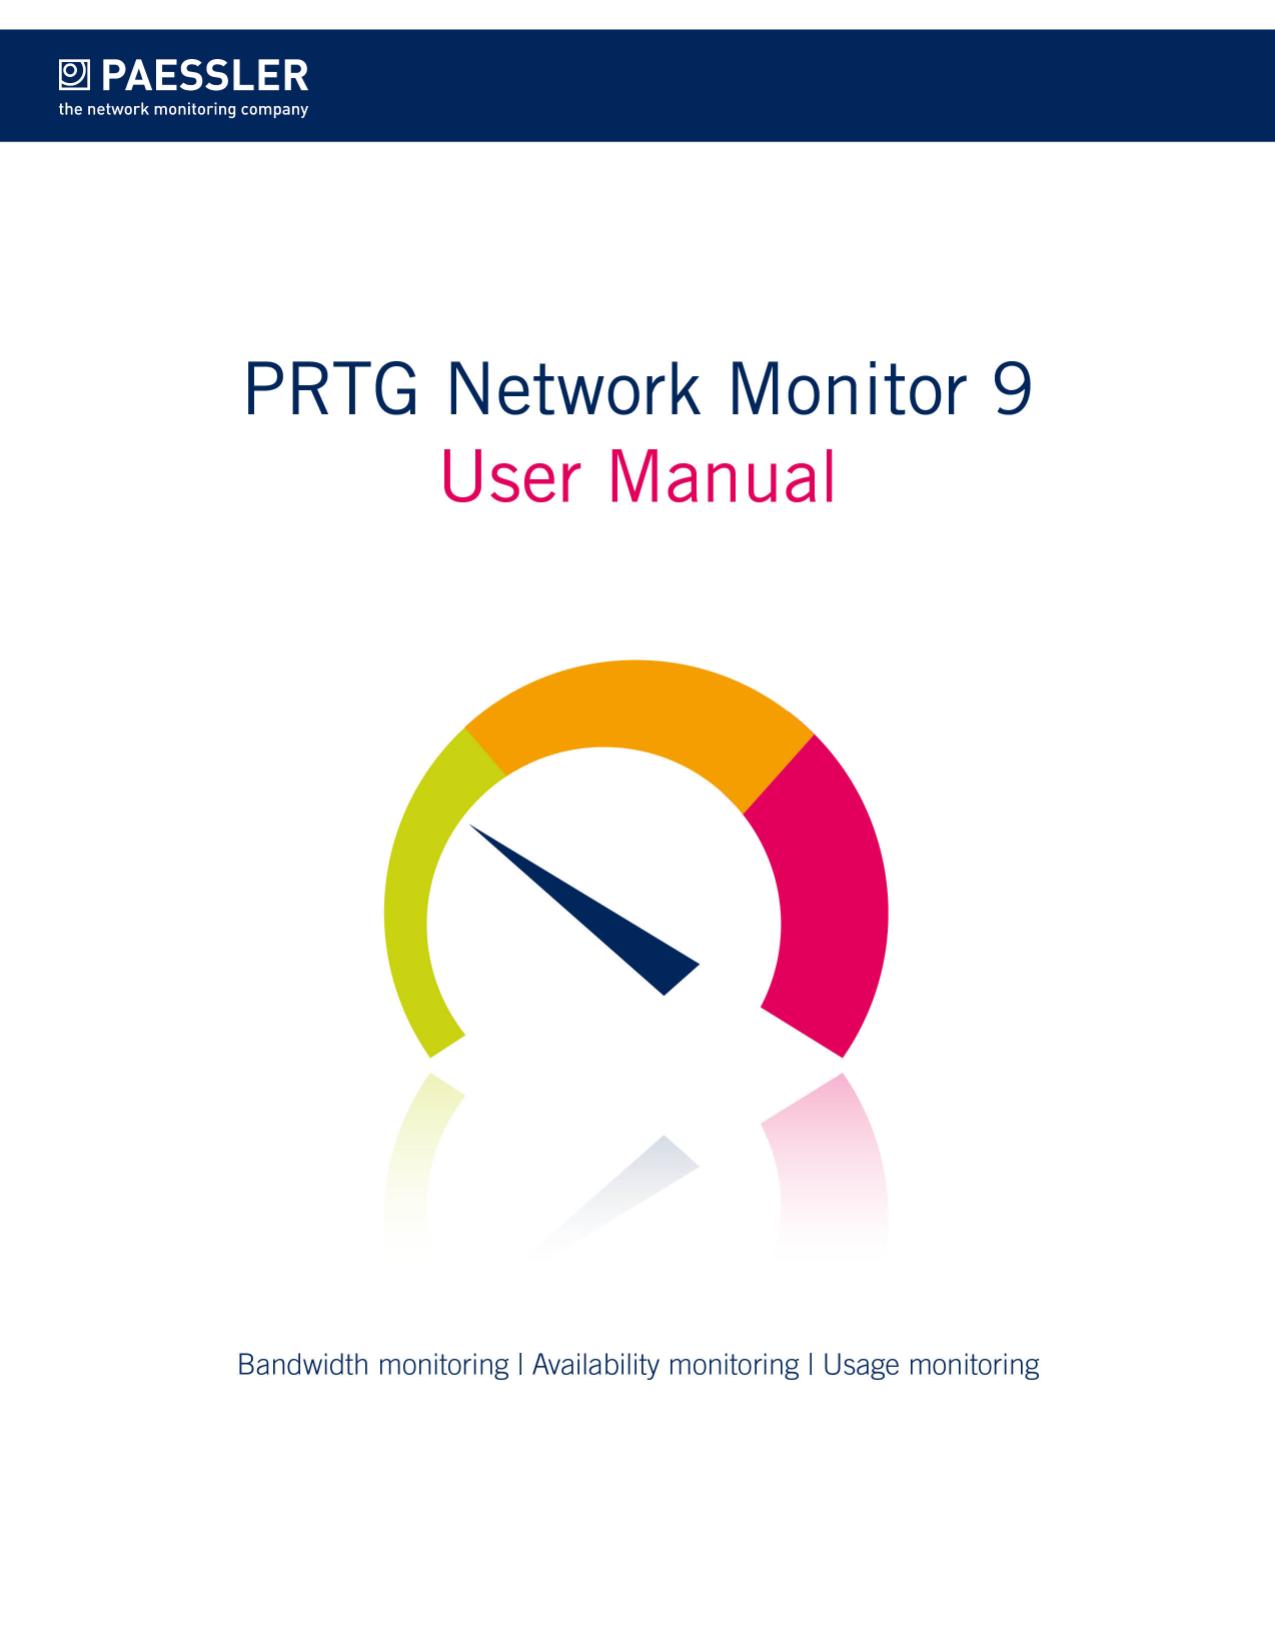 PRTG Network Monitor 9 User Manual | manualzz com